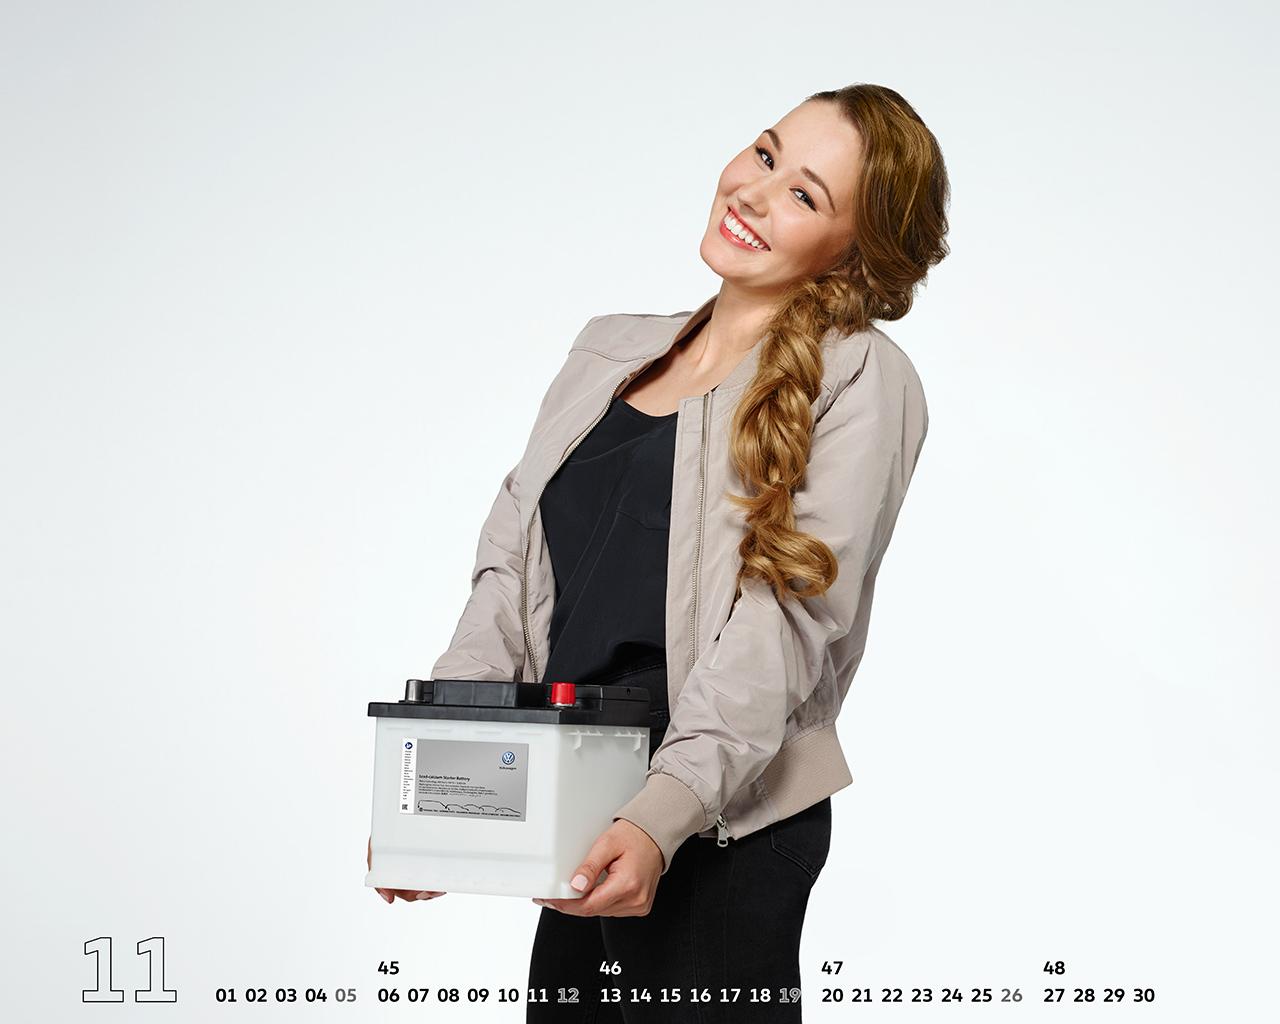 intonic werbeagentur vw kalender 2017